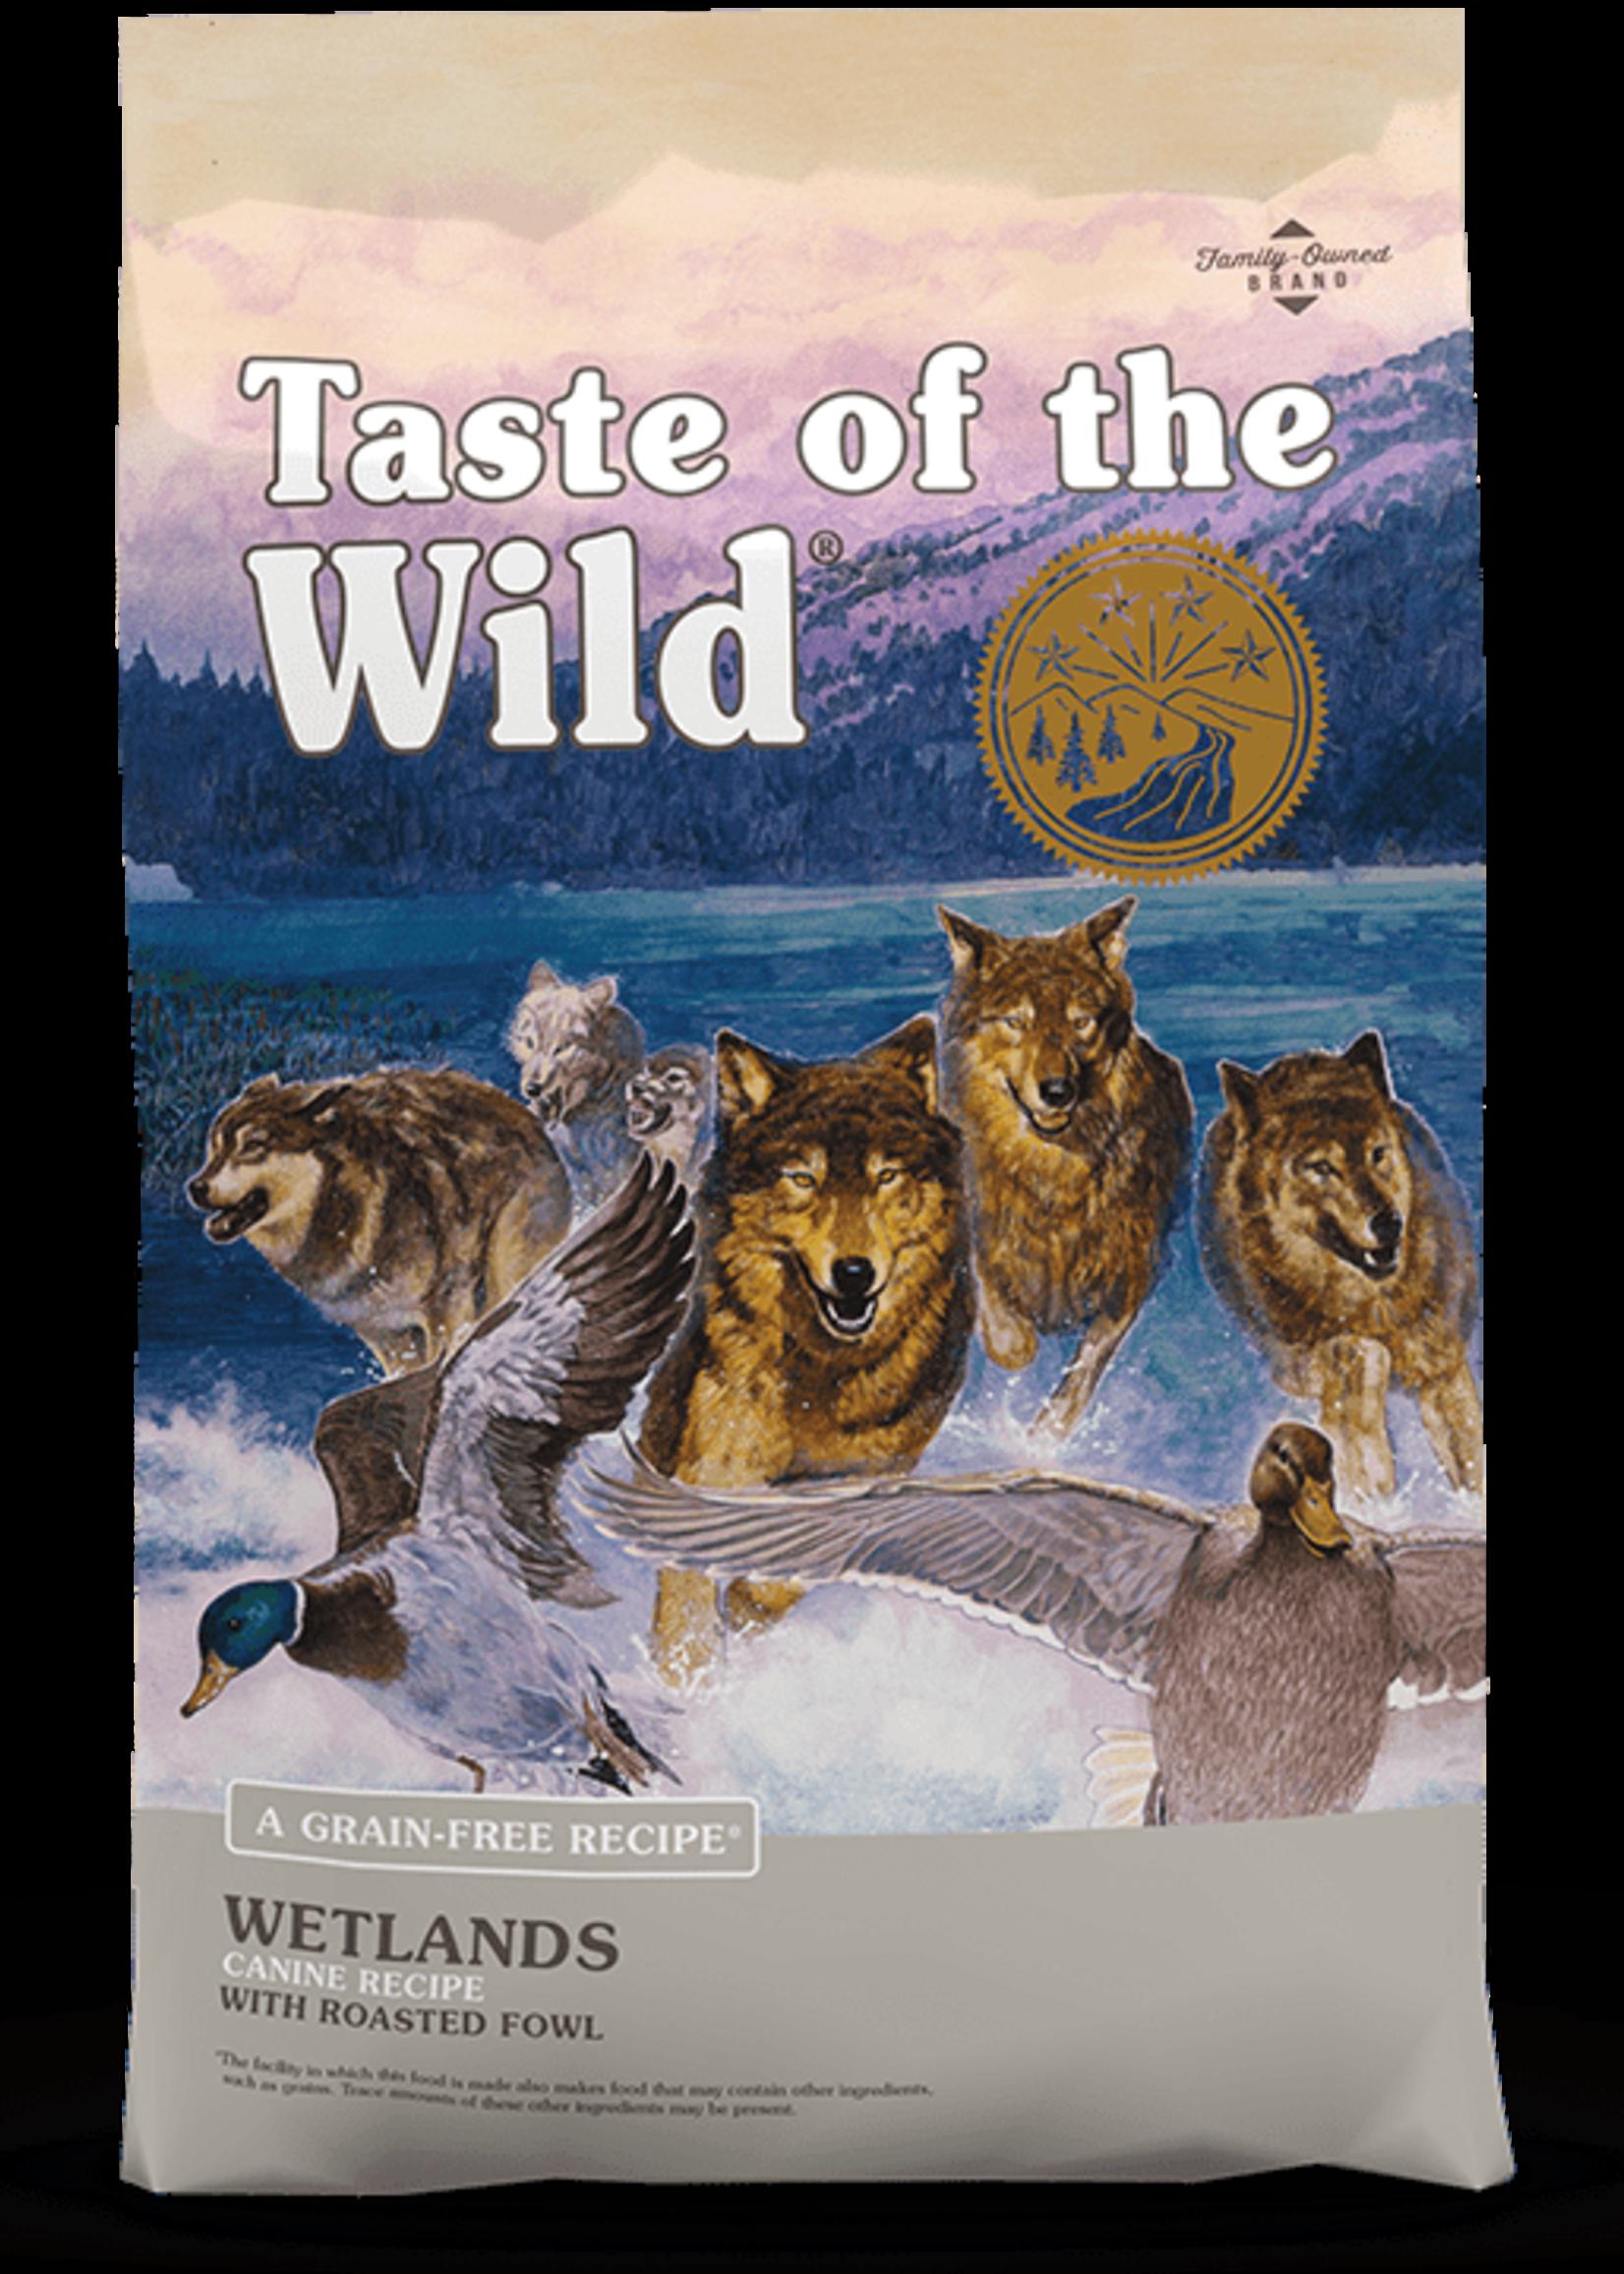 Taste of the Wild® TASTE OF THE WILD GF WETLANDS RECIPE w/ROASTED FOWL 28lbs